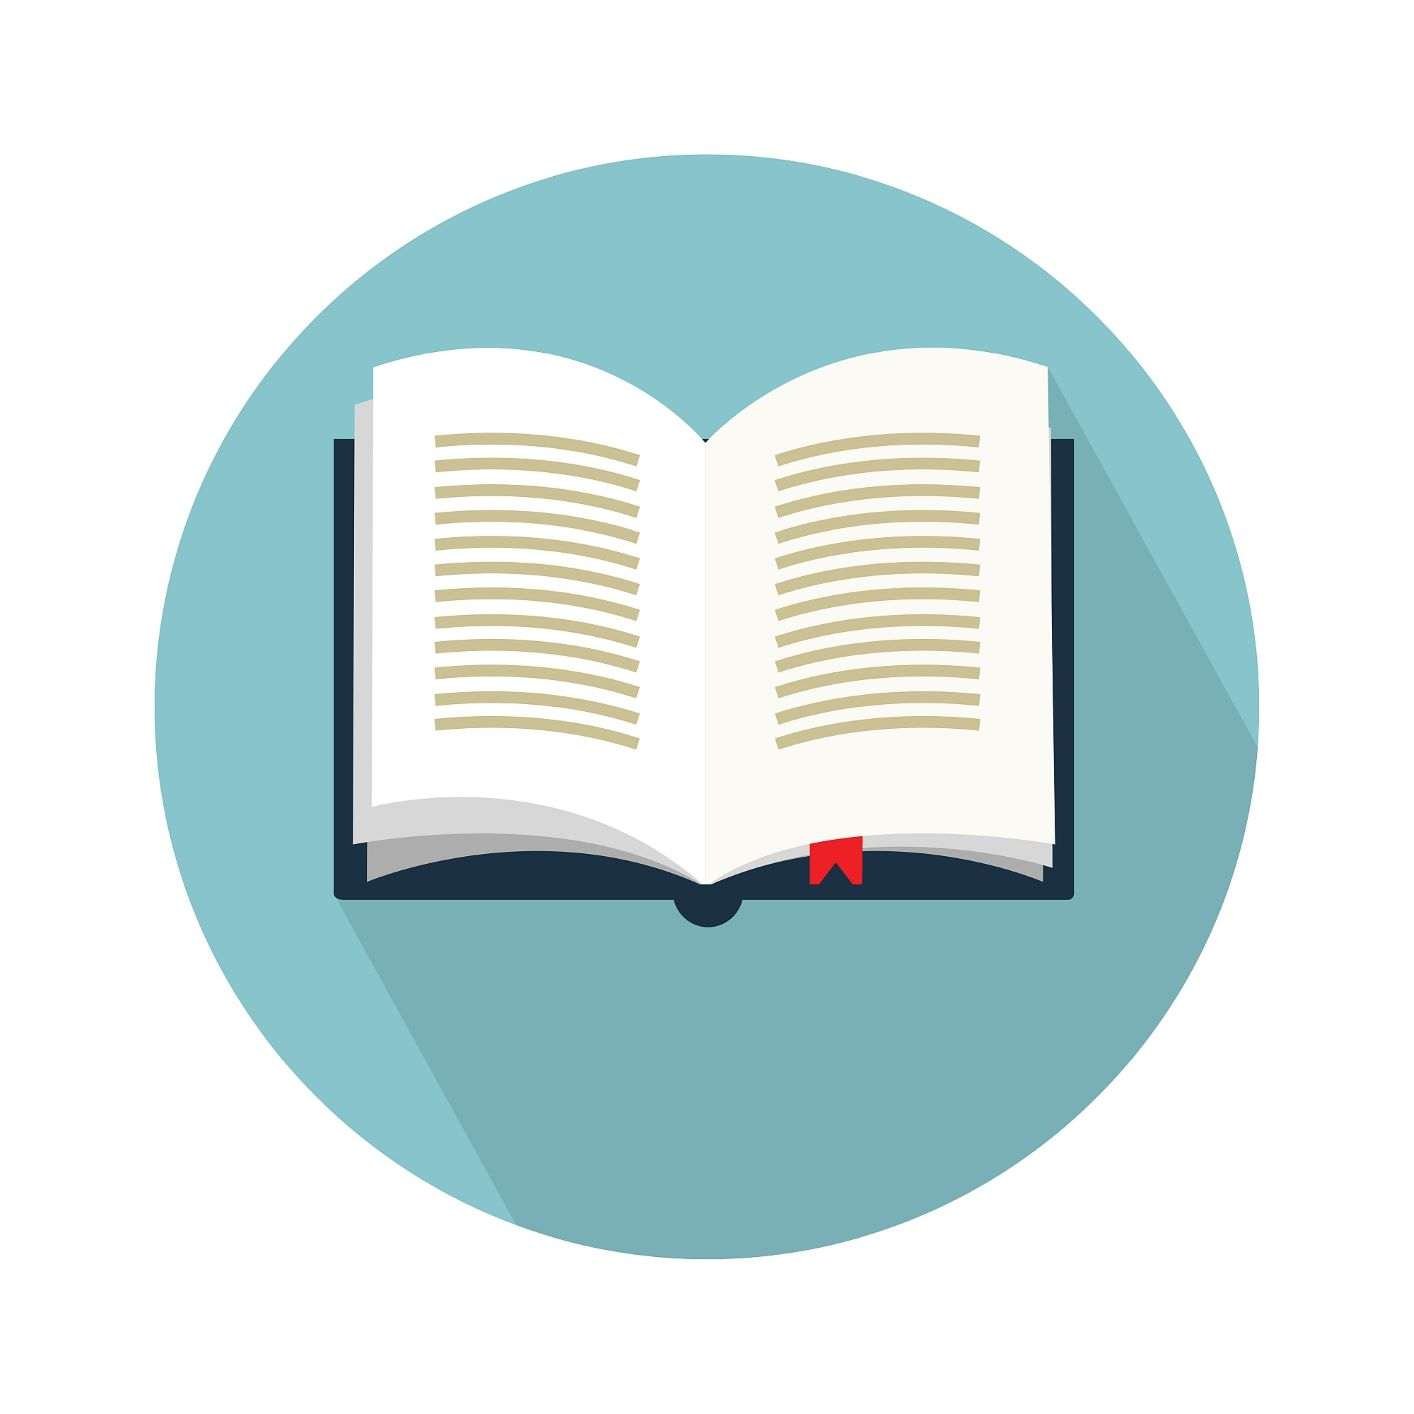 Discover English 1 książka ucznia